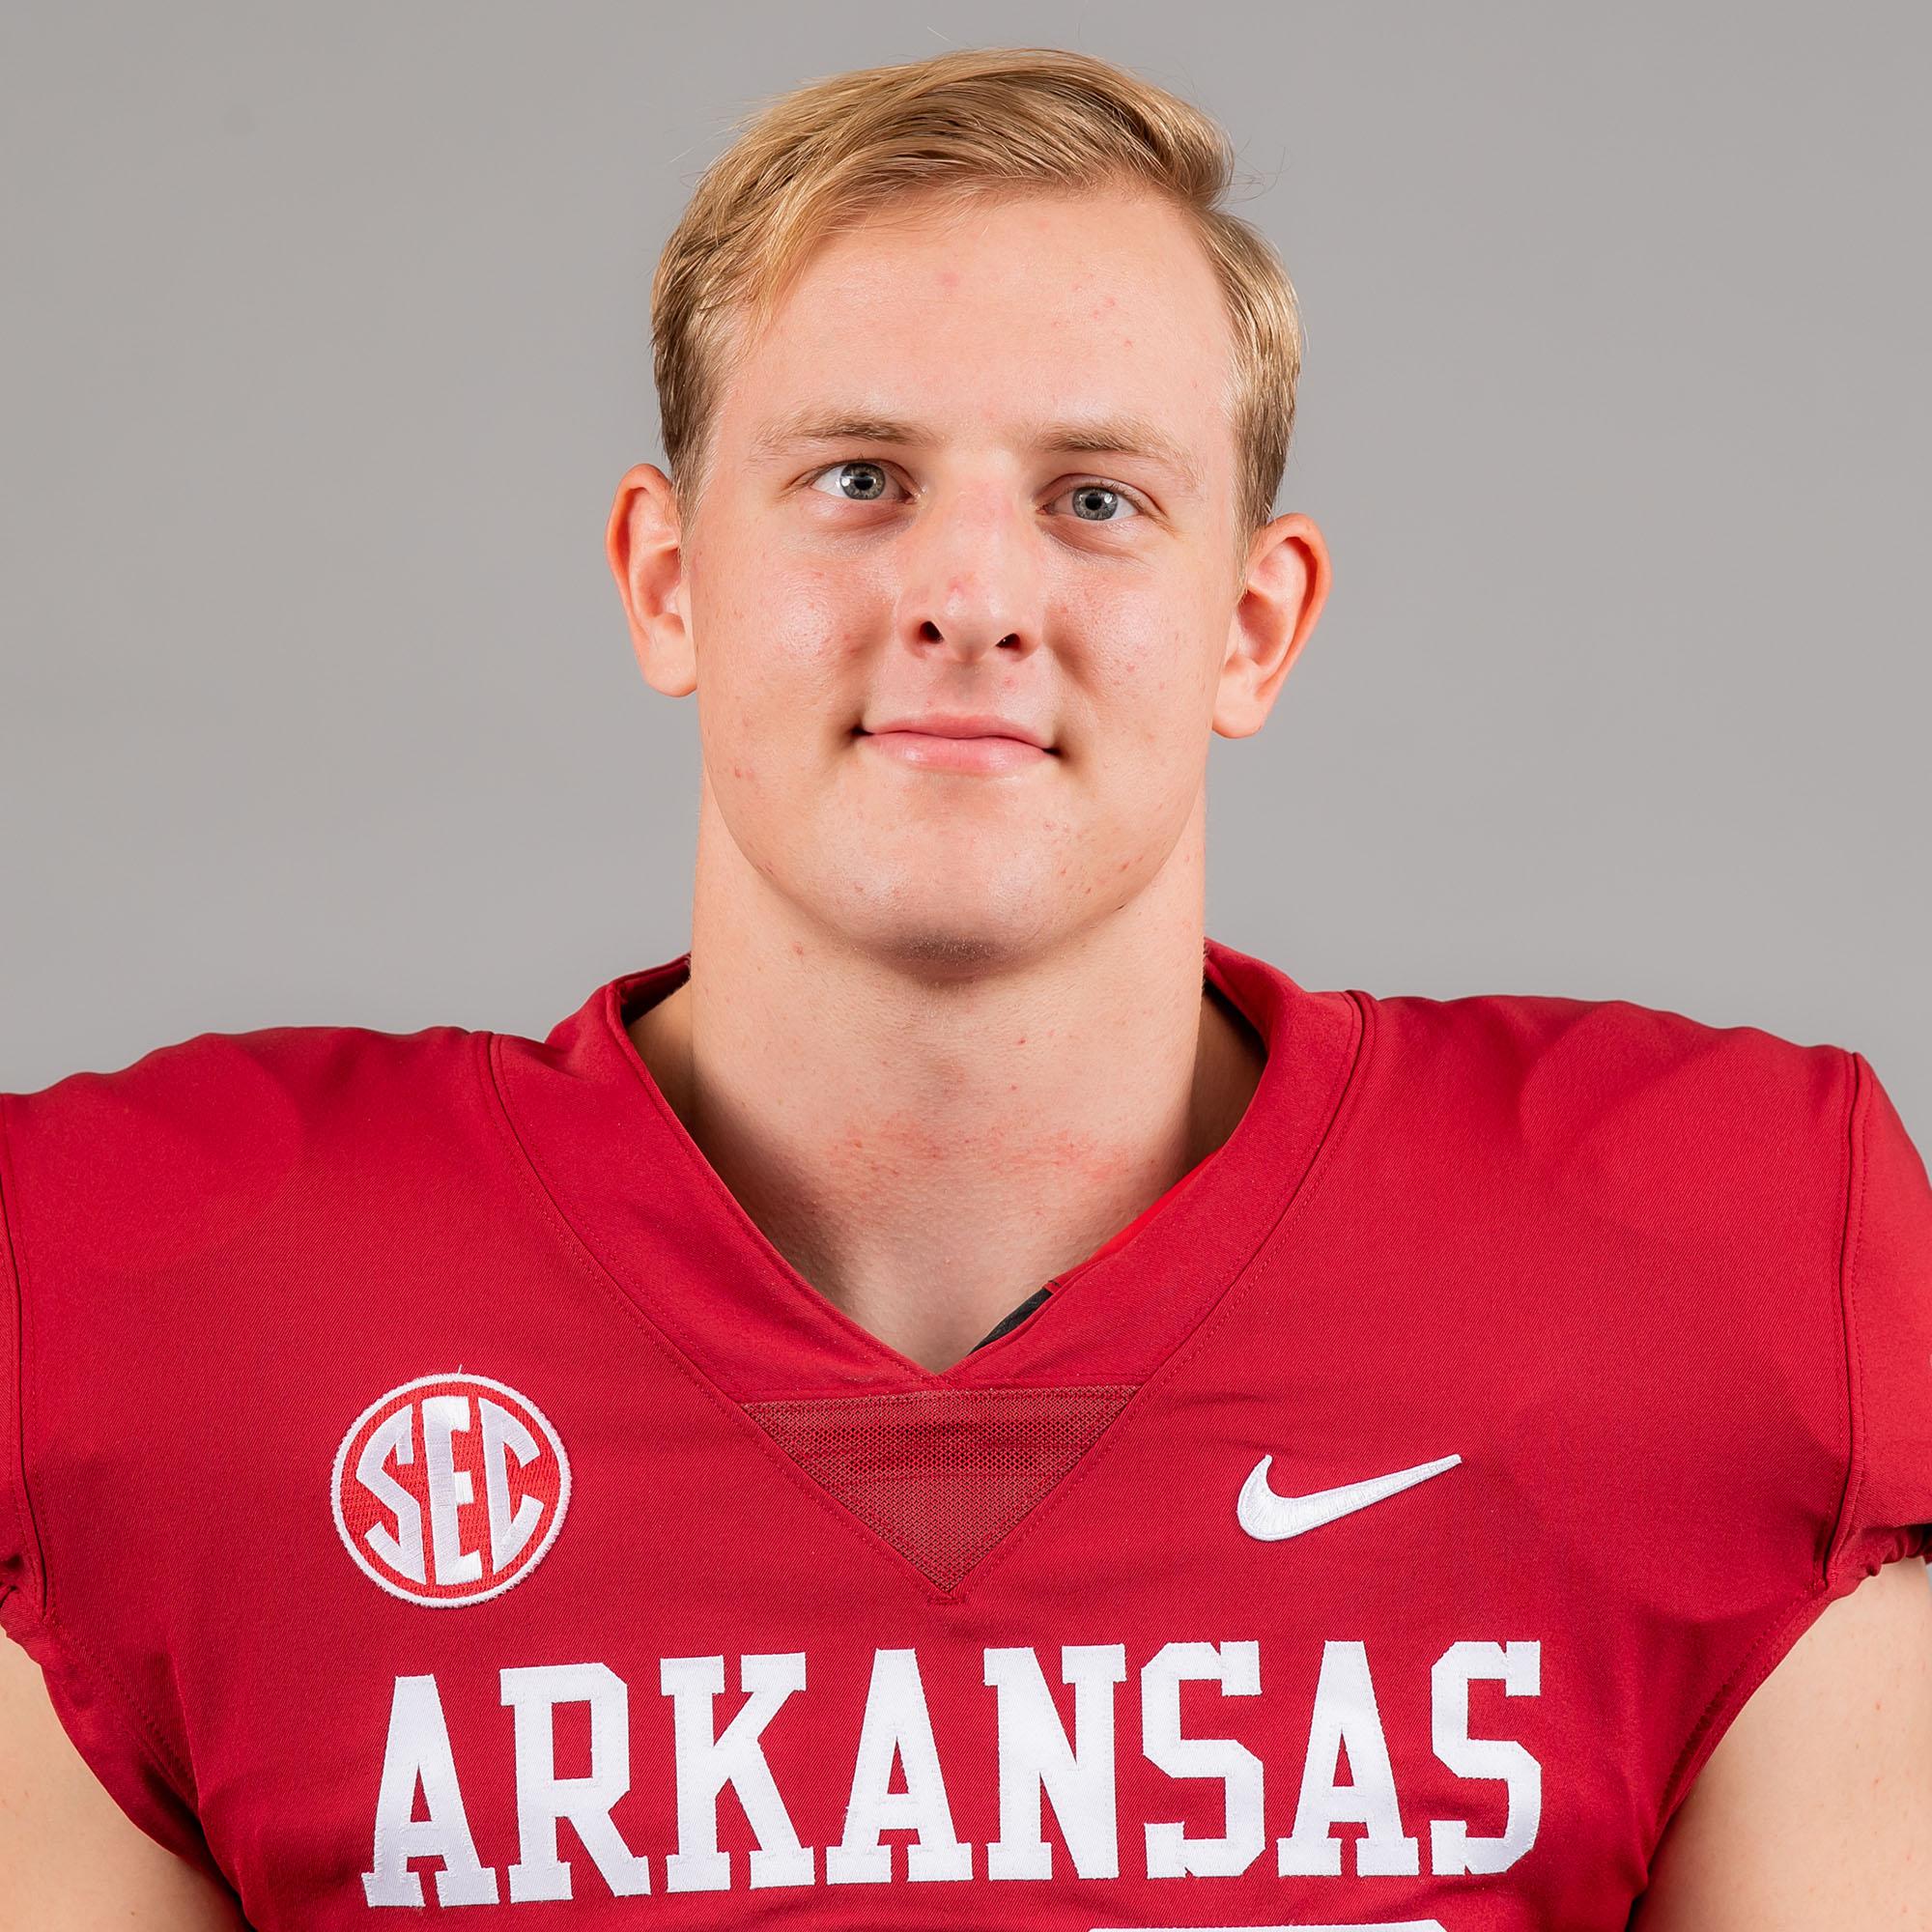 Nathan Bax - Football - Arkansas Razorbacks